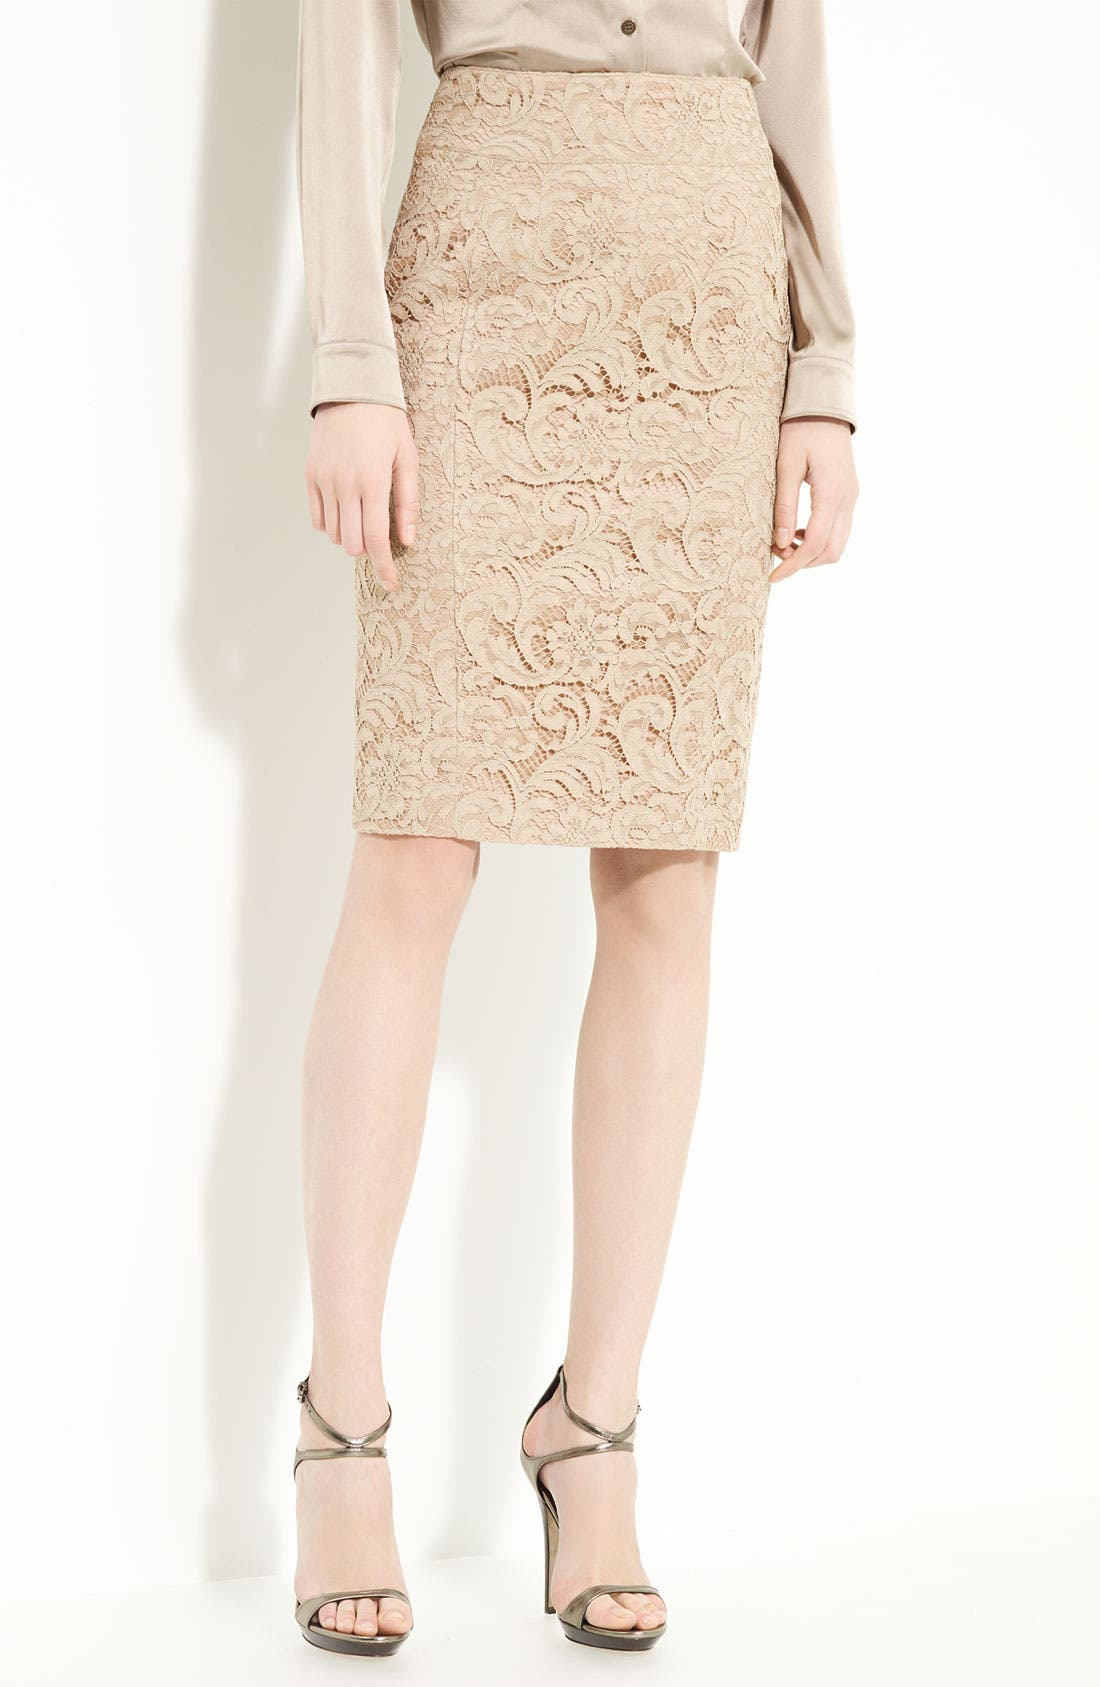 BURBERRY LONDON Lace Pencil Skirt, Main, color, 270